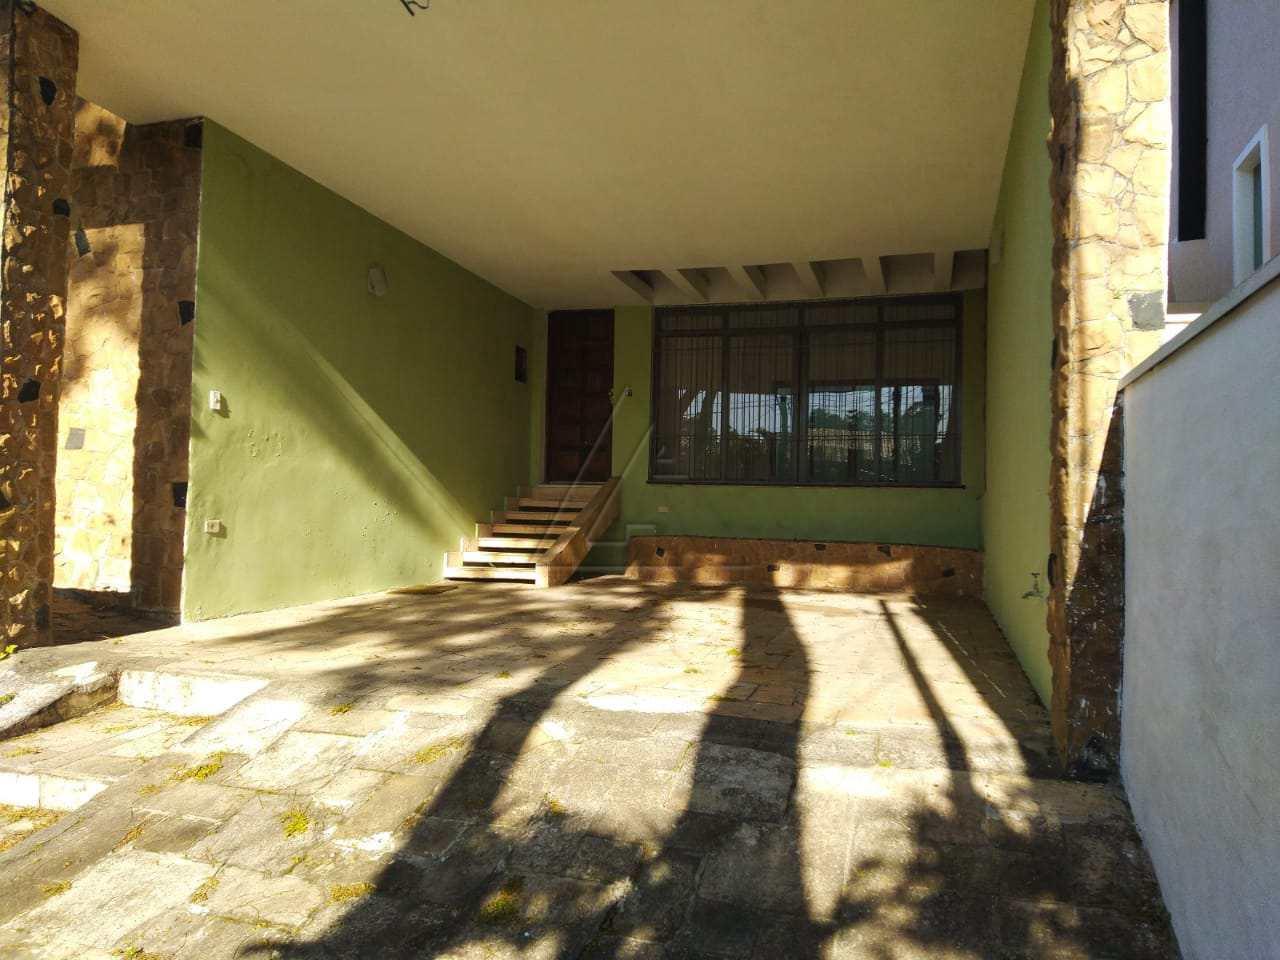 Casa com 3 dorms, Jardim Jussara, São Paulo - R$ 850 mil, Cod: 1605